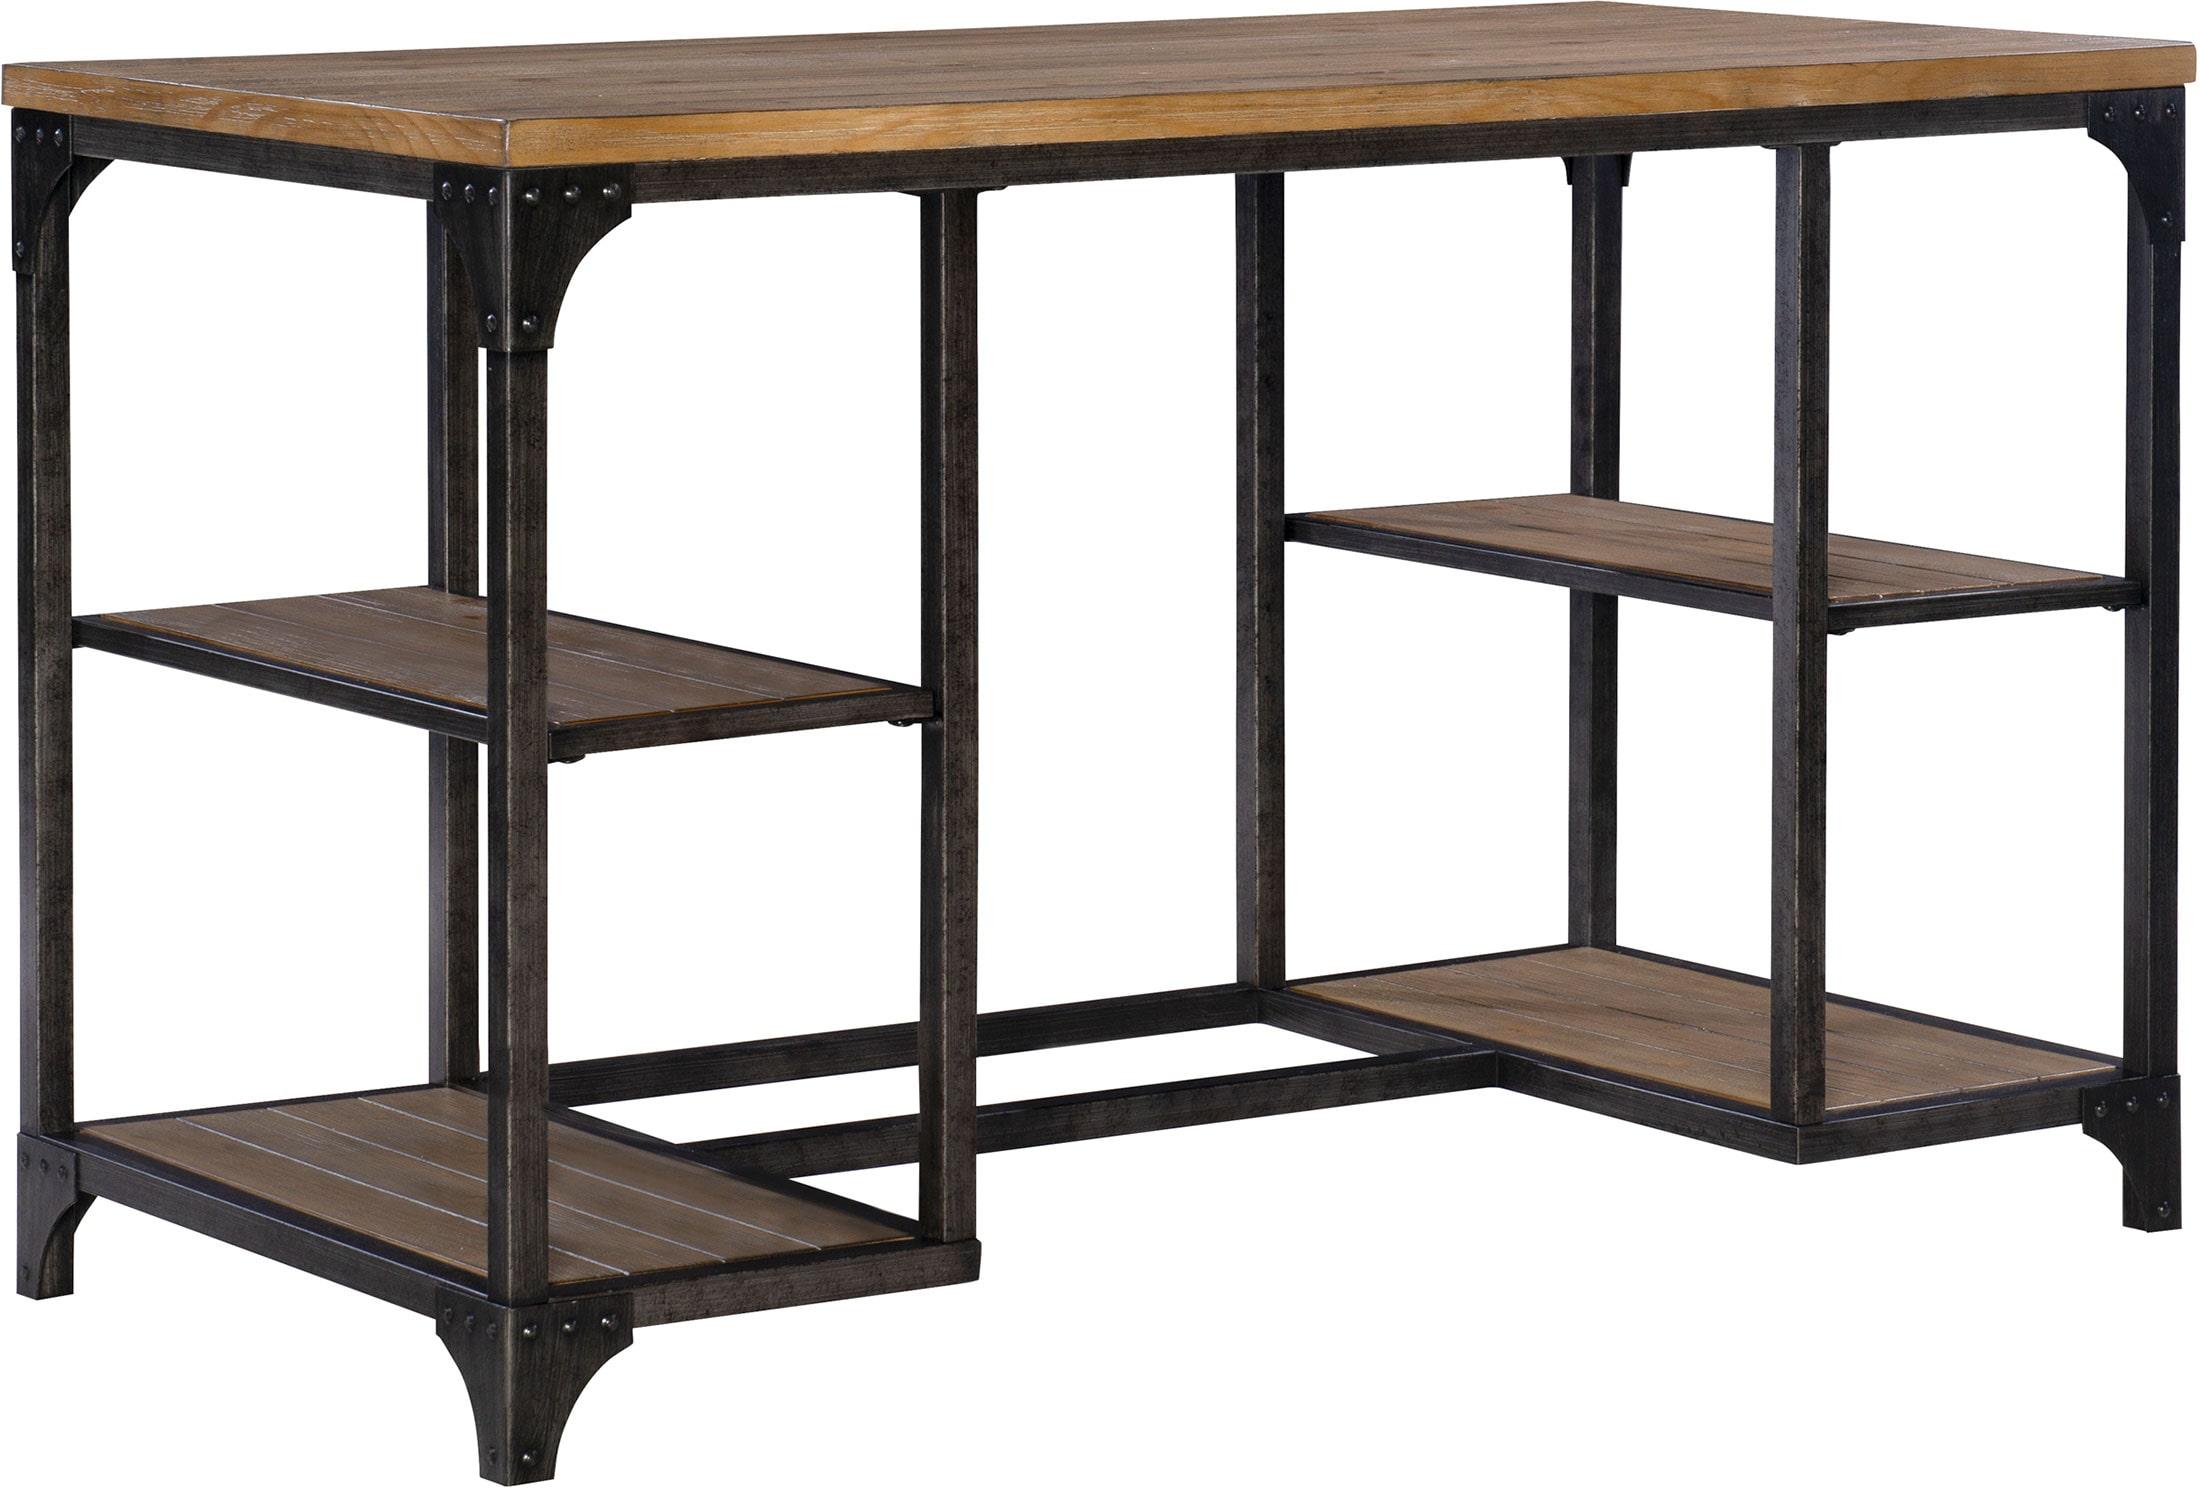 Home Office Furniture - Ridge Desk